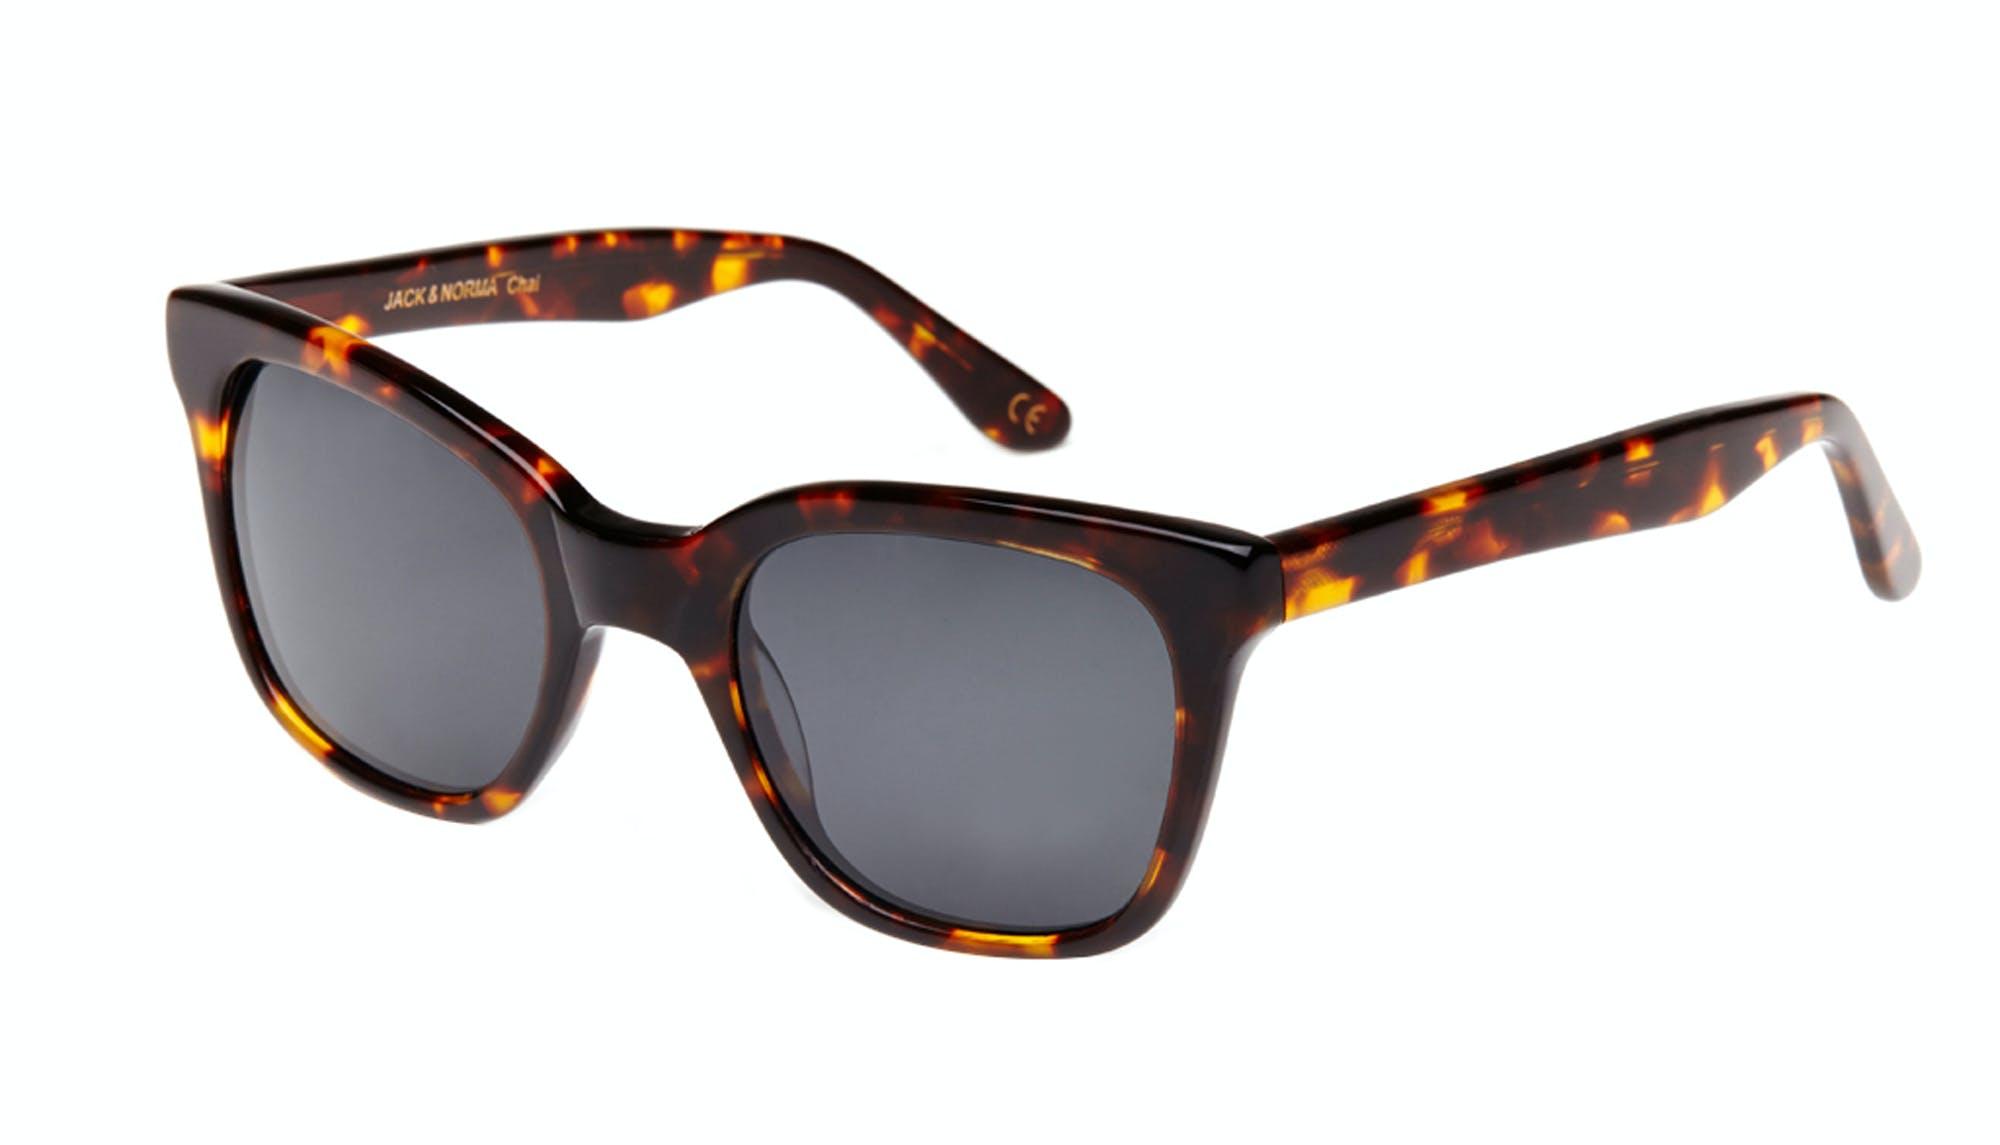 Affordable Fashion Glasses Rectangle Square Sunglasses Women Jack & Norma chai Tilt